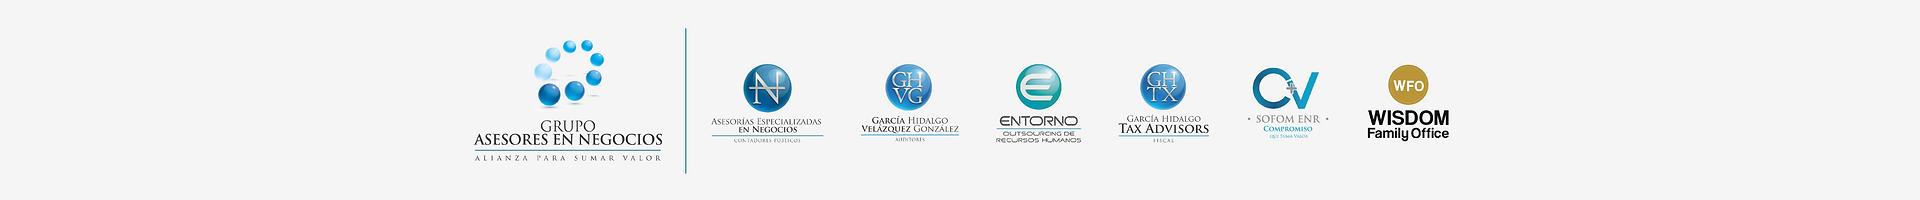 Banner Somos GAN_2-02.png